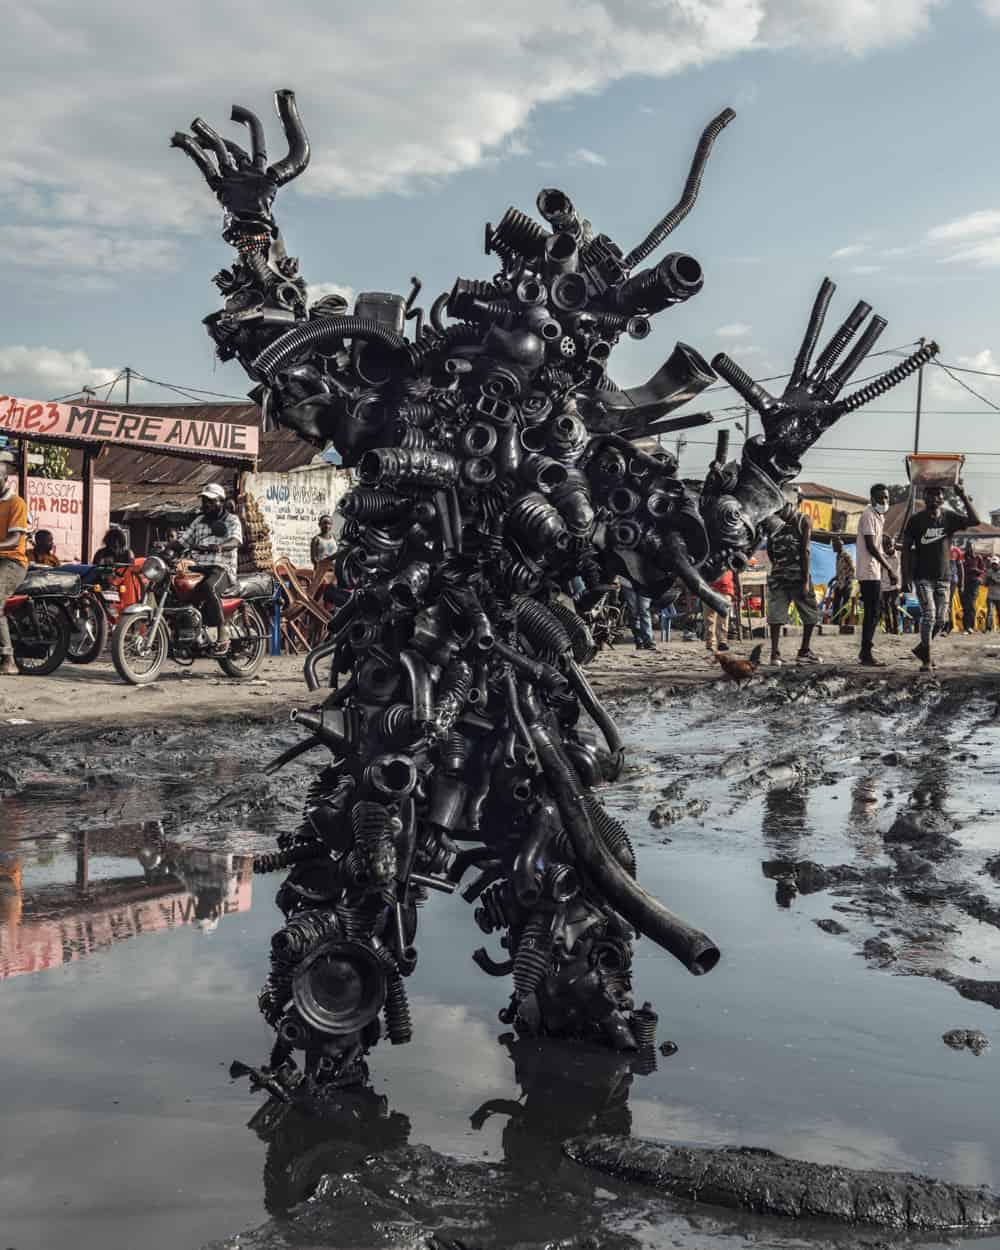 Untitled #9, 2020 Homo Detritus, Real Portraitik #5 Kinshasa, RDC ©Stephan Gladieu